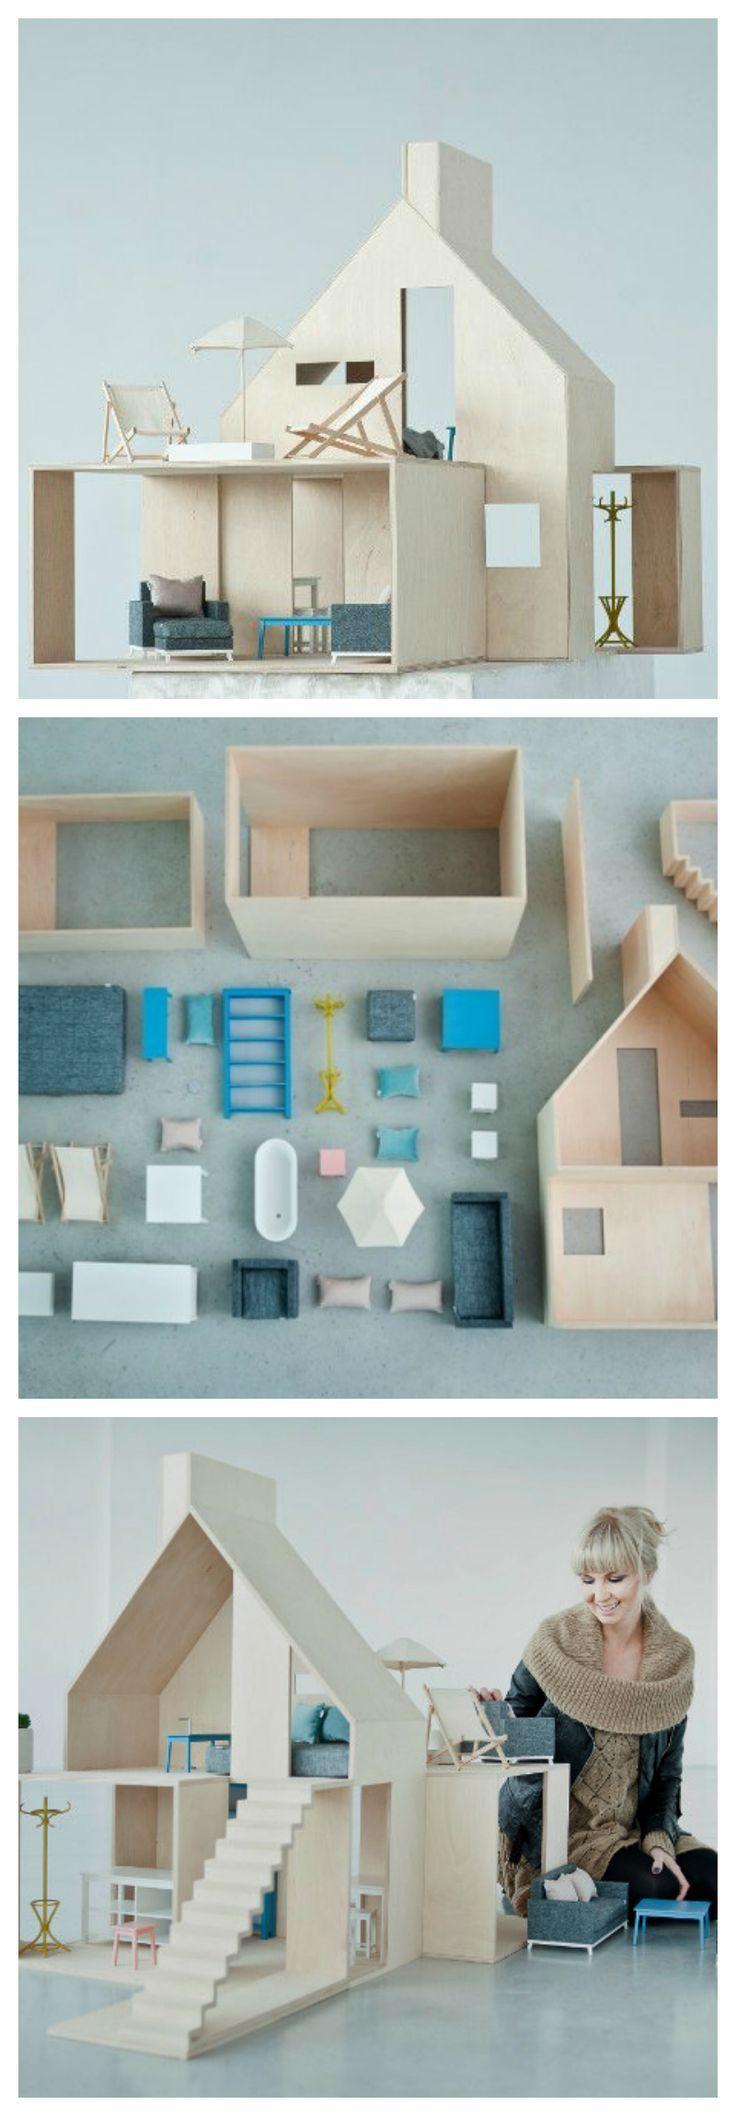 Modern doll's house - Petit & Small